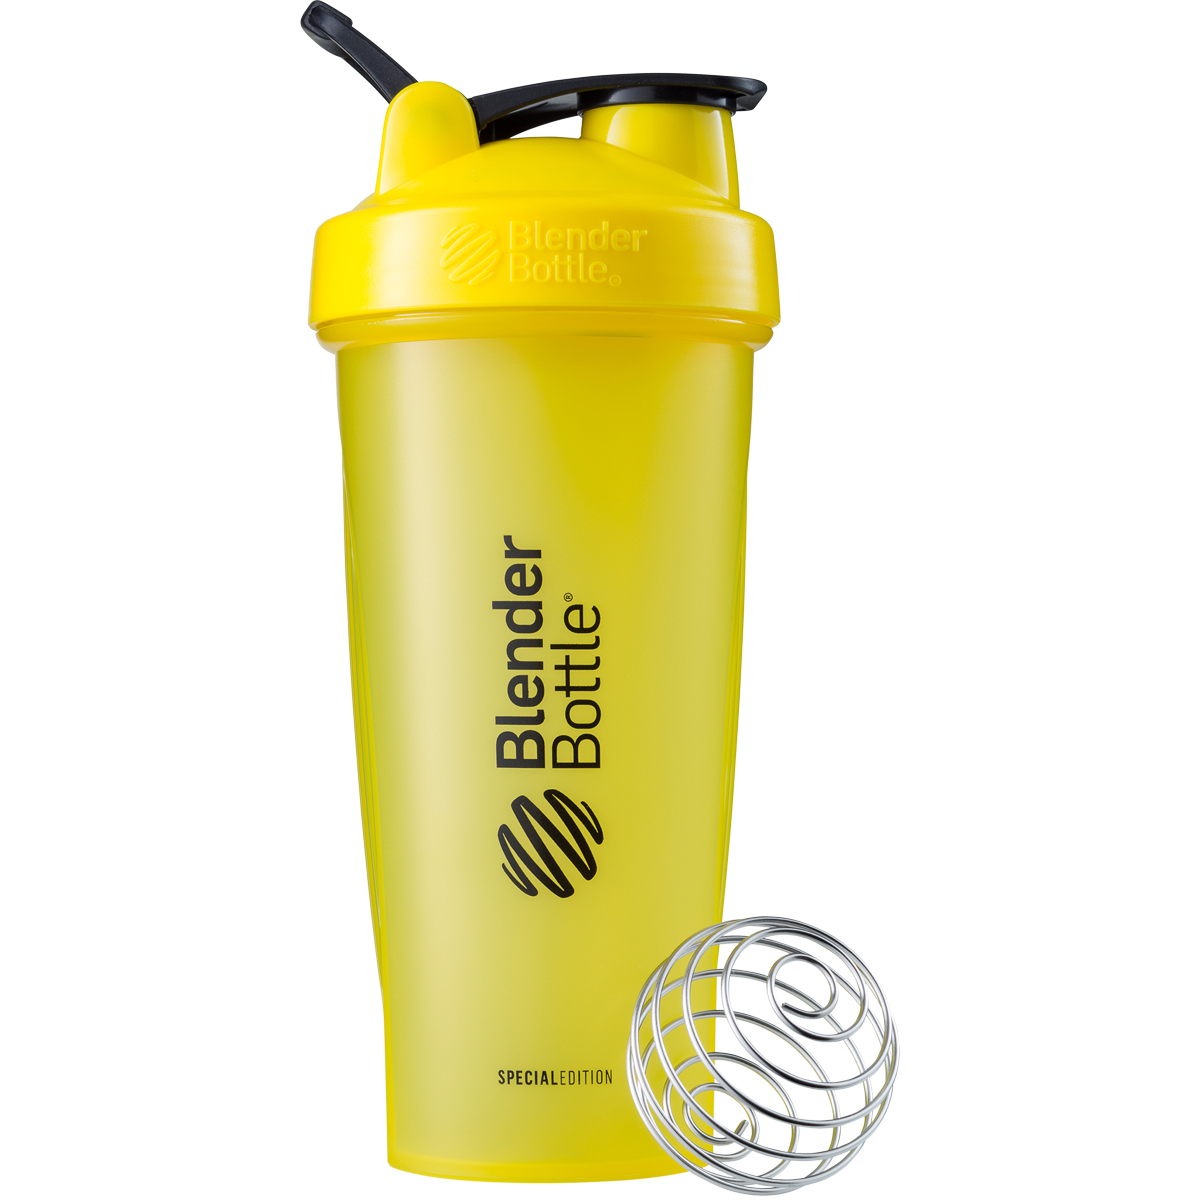 Blender Bottle Special Edition 28 oz. Shaker with Loop Top - Killer Bee